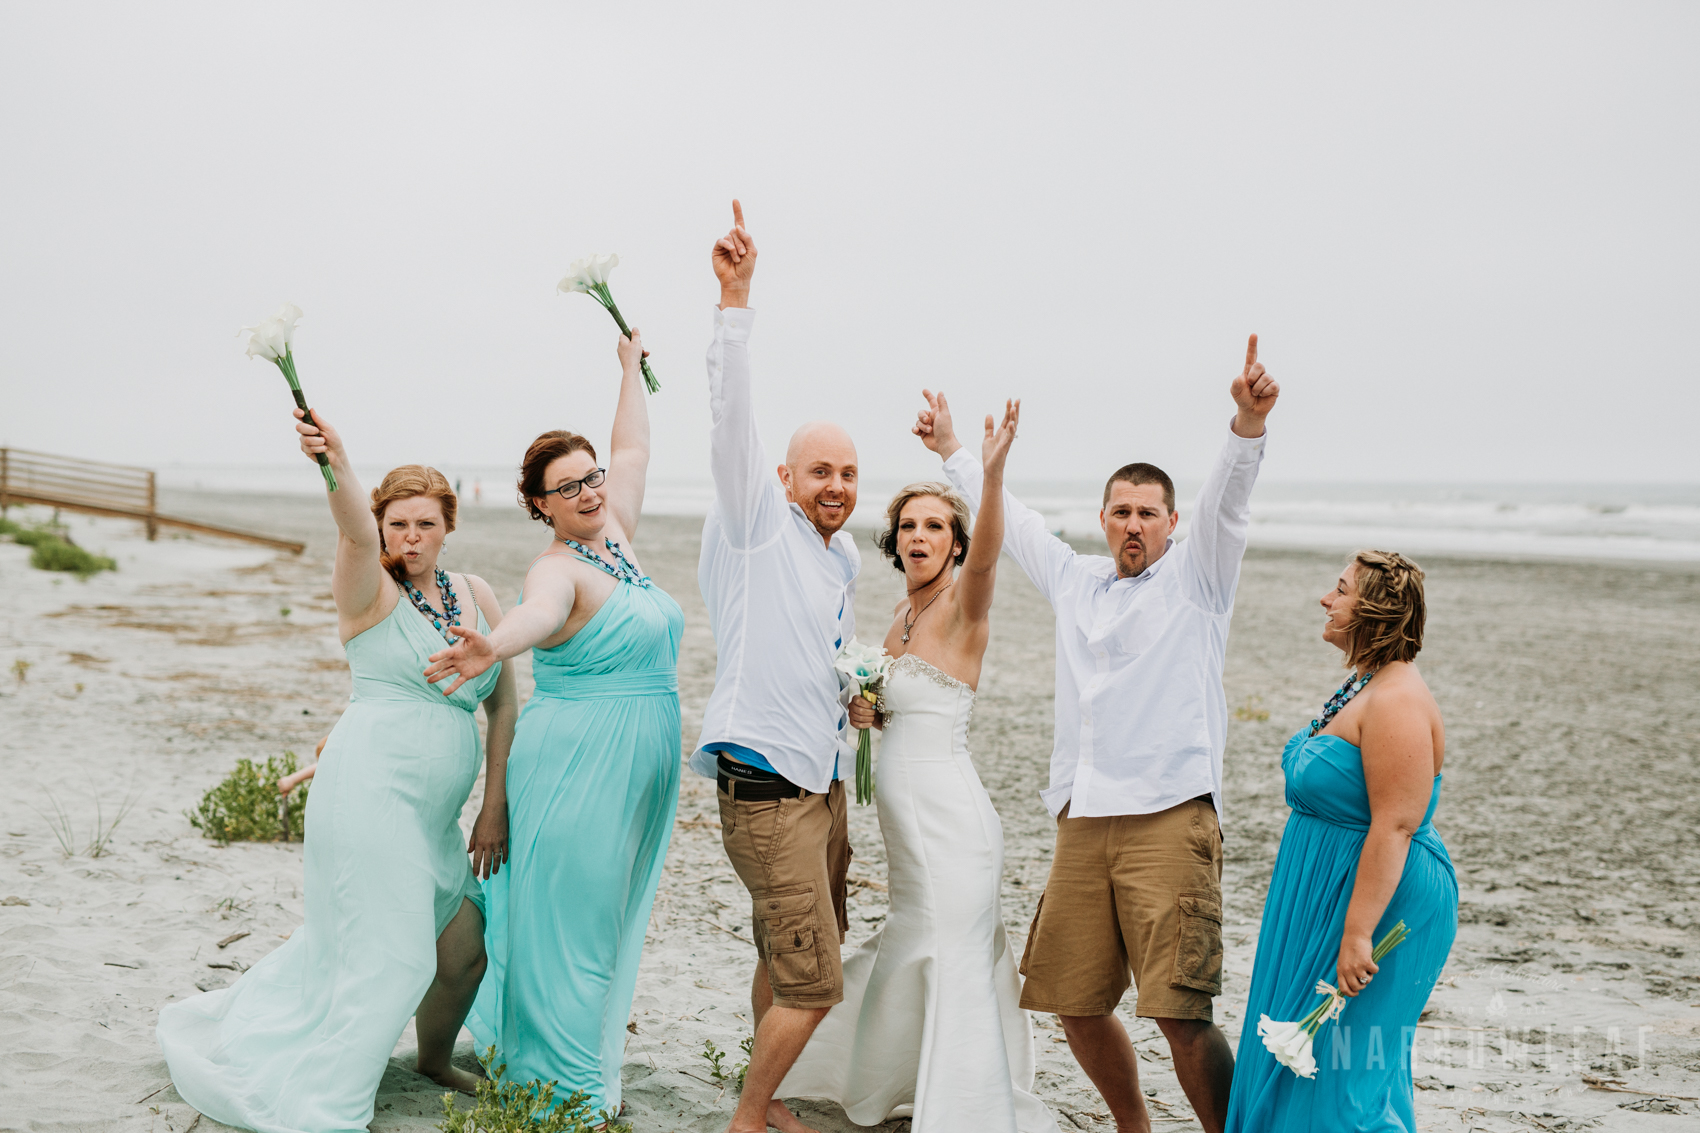 south-carolina-folly-beach-destination-wedding-NarrowLeaf_Love_&_Adventure_Photography-2097.jpg